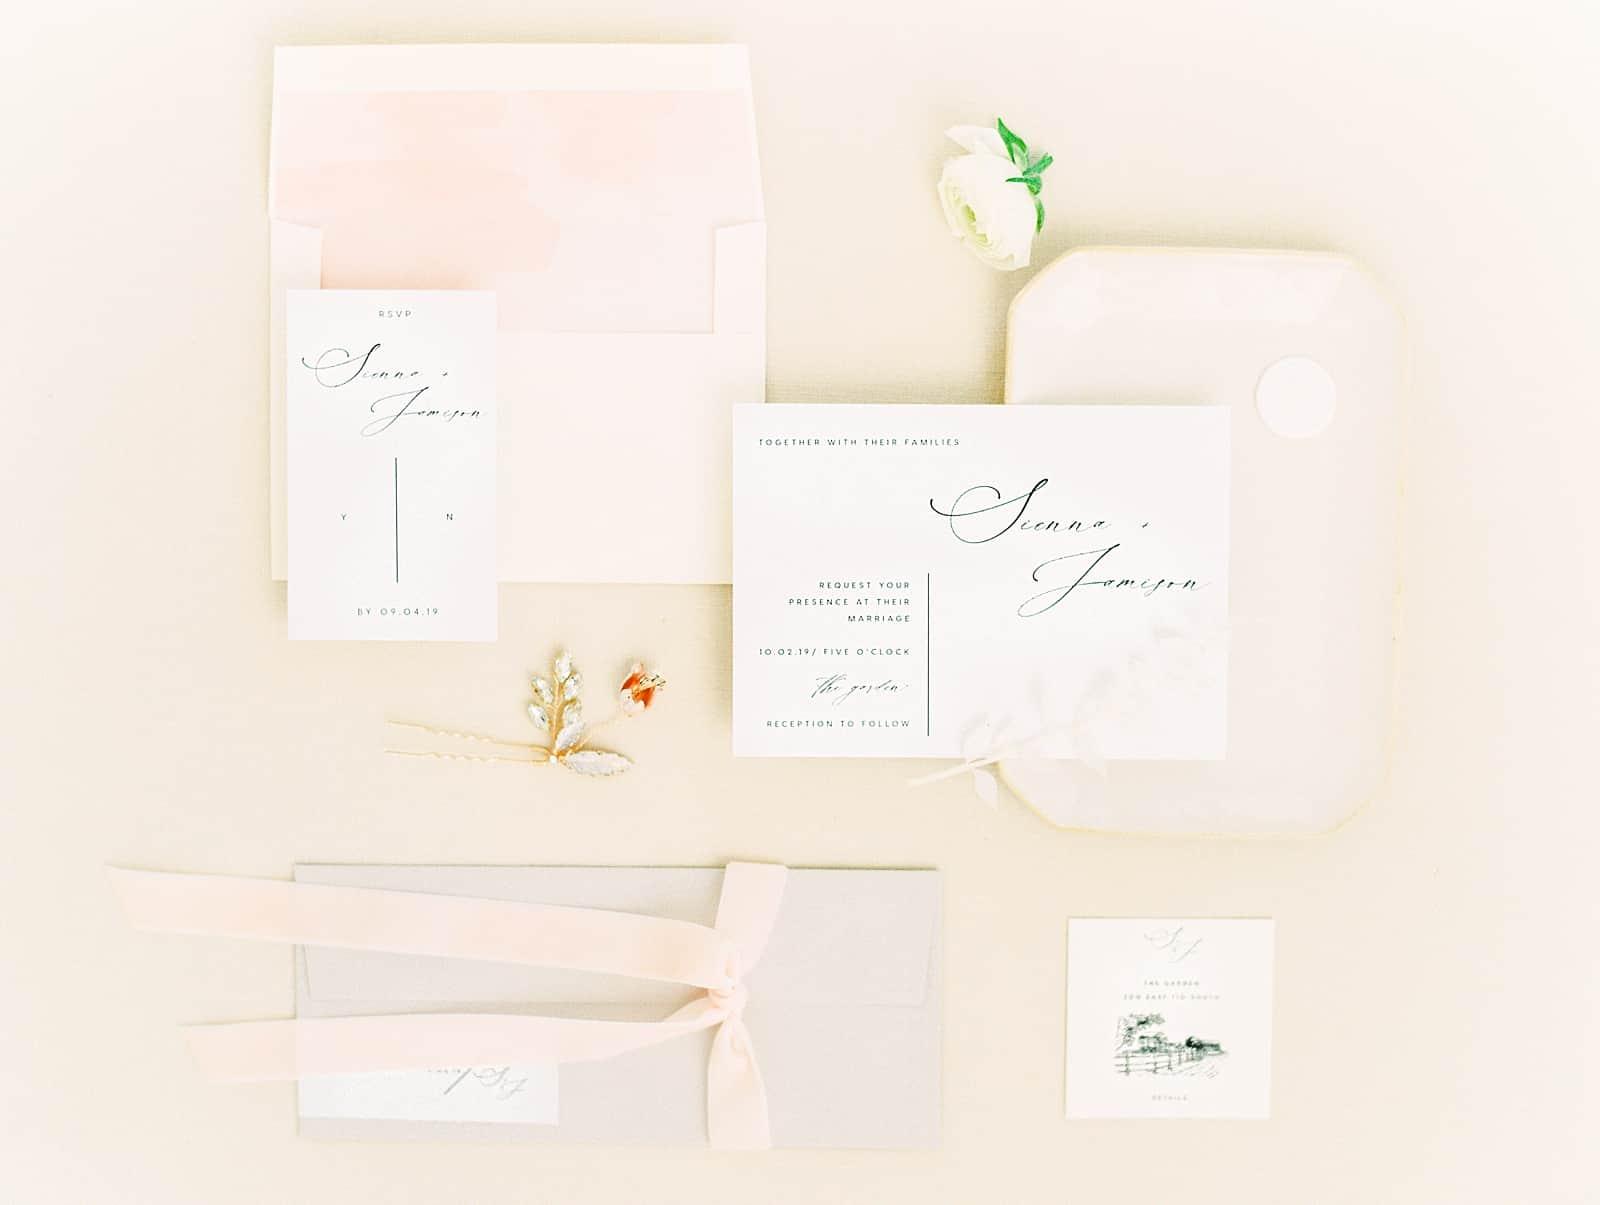 Modern minimalist wedding invitations with calligraphy